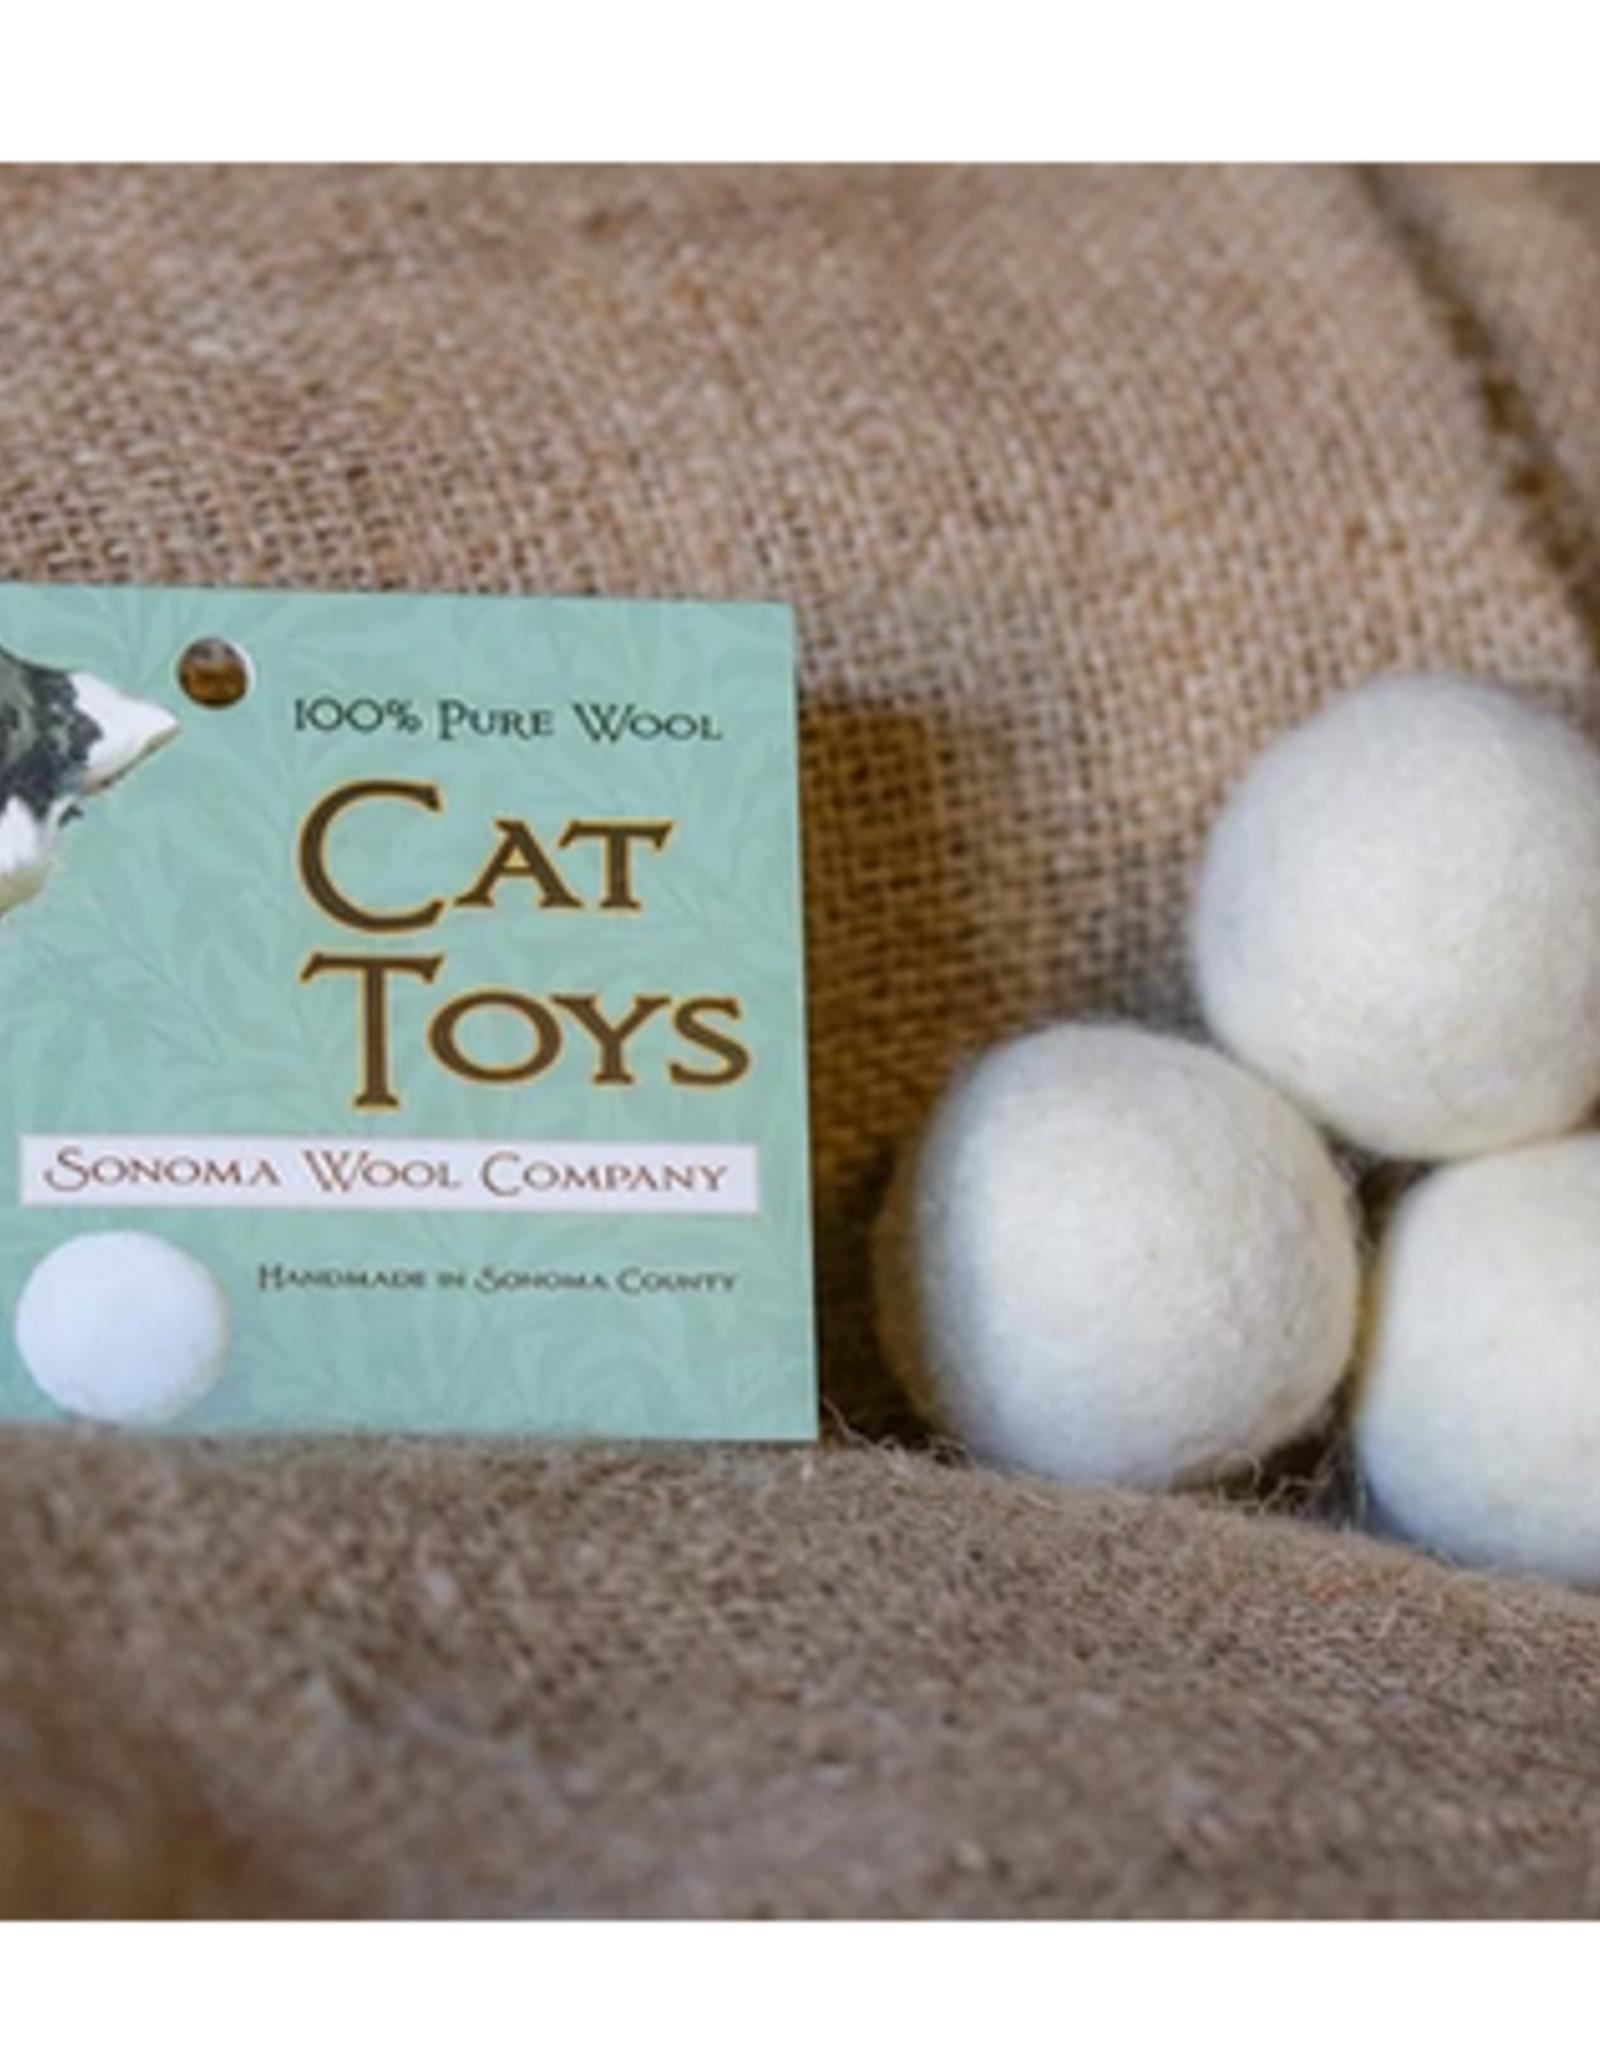 Wool Cat Toys